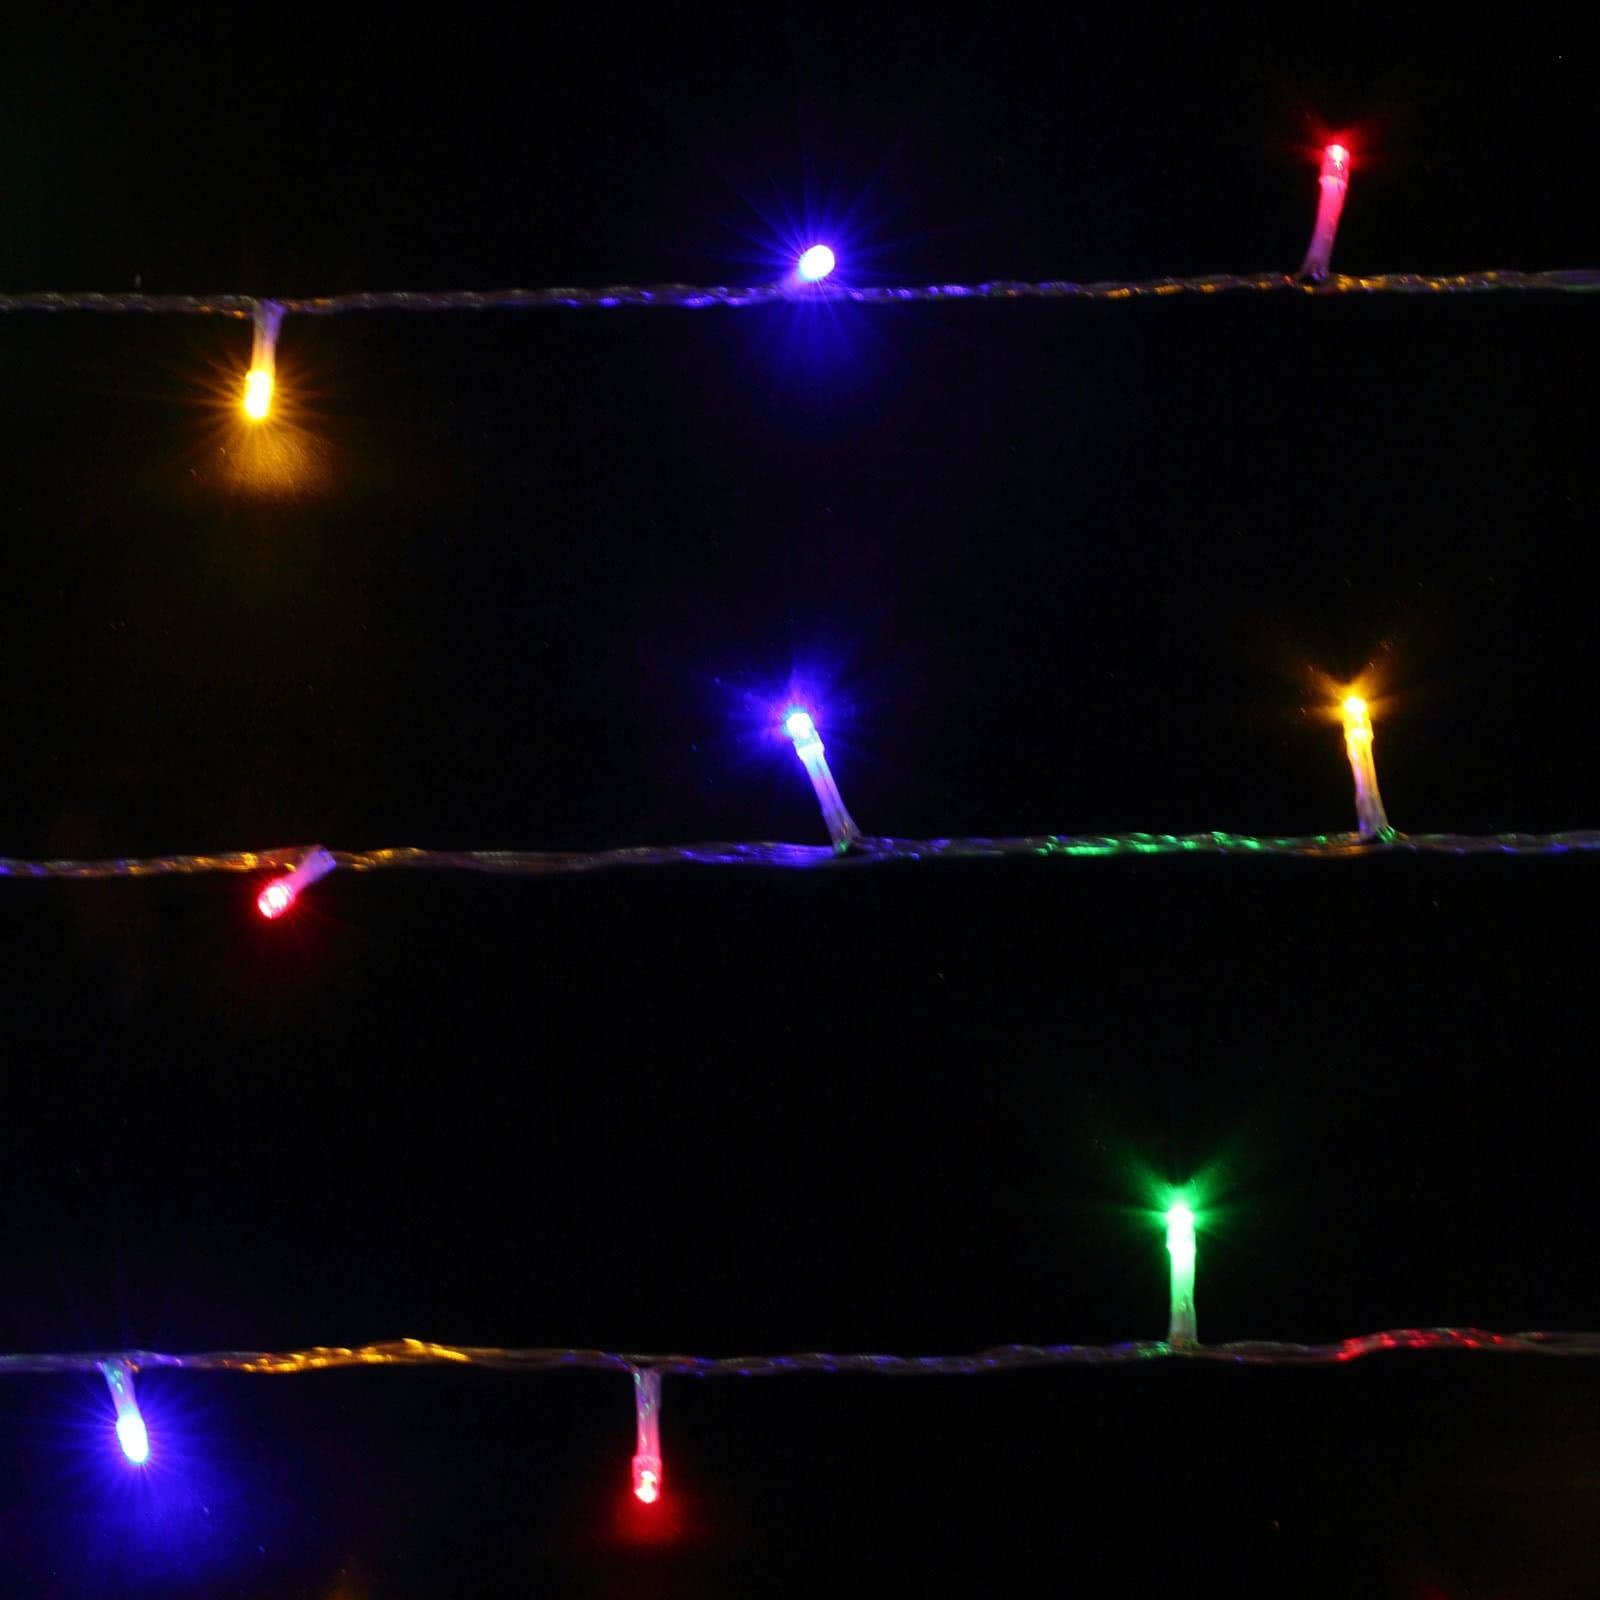 Weihnachtsbeleuchtung Bunt.400er Led Lichterkette Rgb Yorbay De